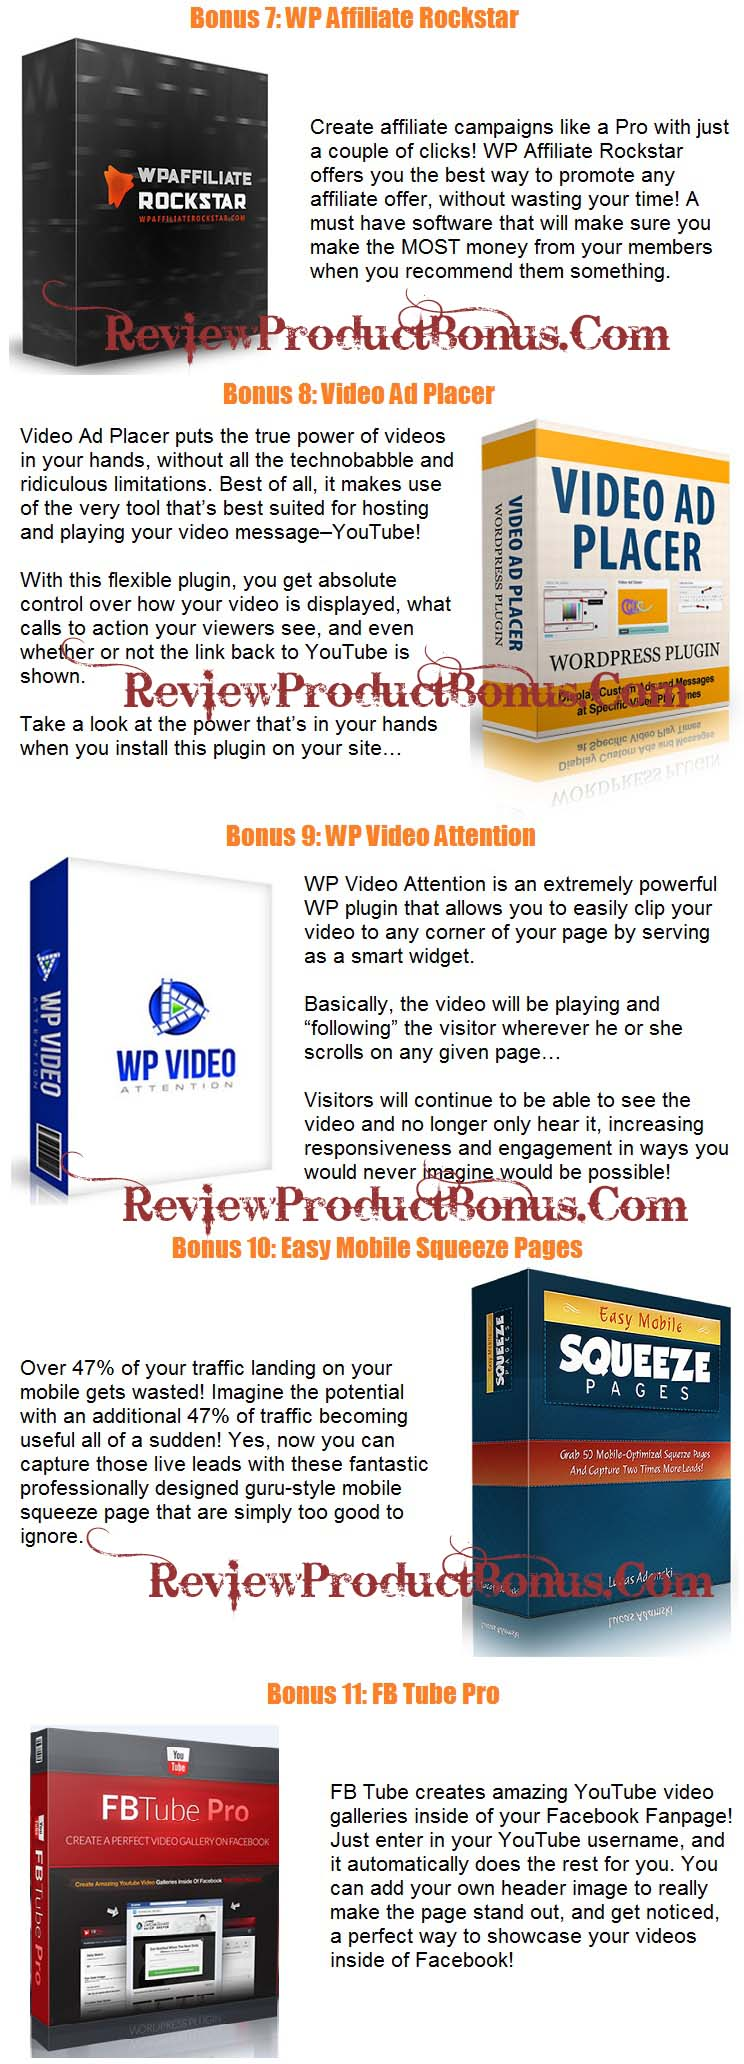 ClickVidio Bonuses